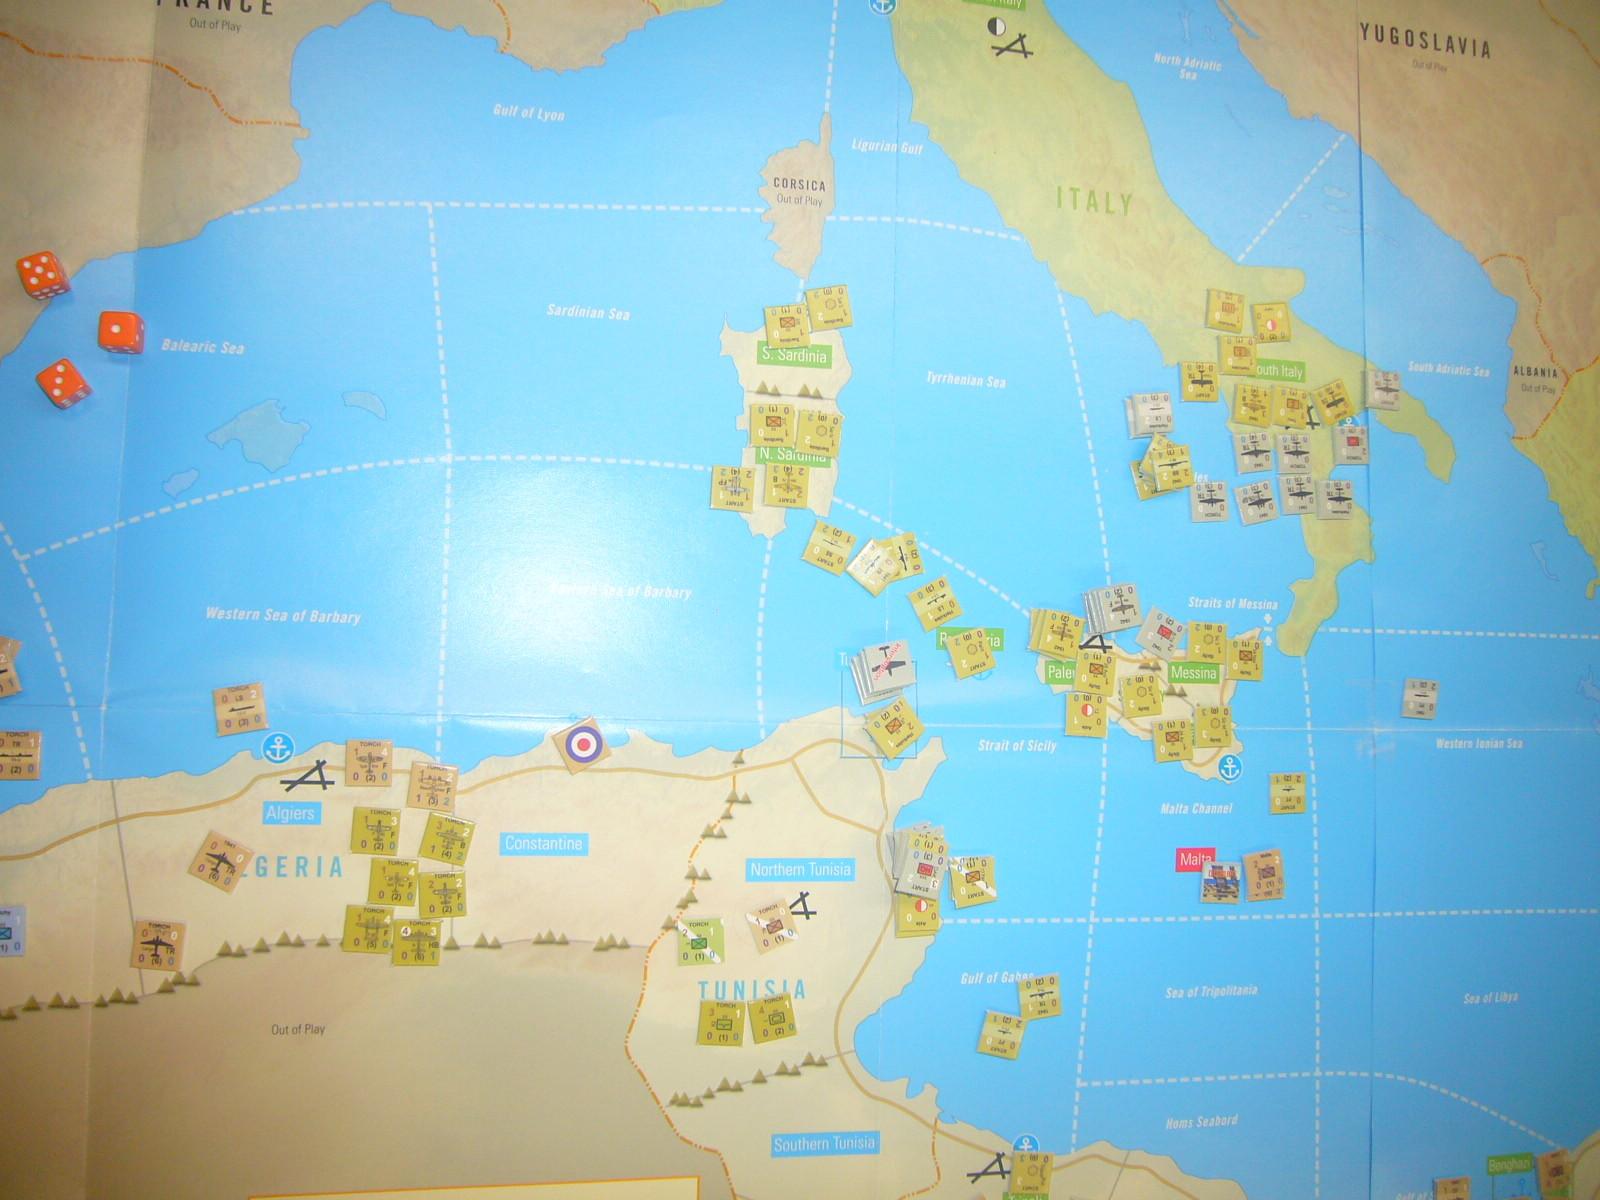 YSGA8月例会の様子その5〔これもひとつの地中海キャンペーン:(WaW誌)Mare Nostrum: War in the Mediterranean〕_b0173672_20091845.jpg